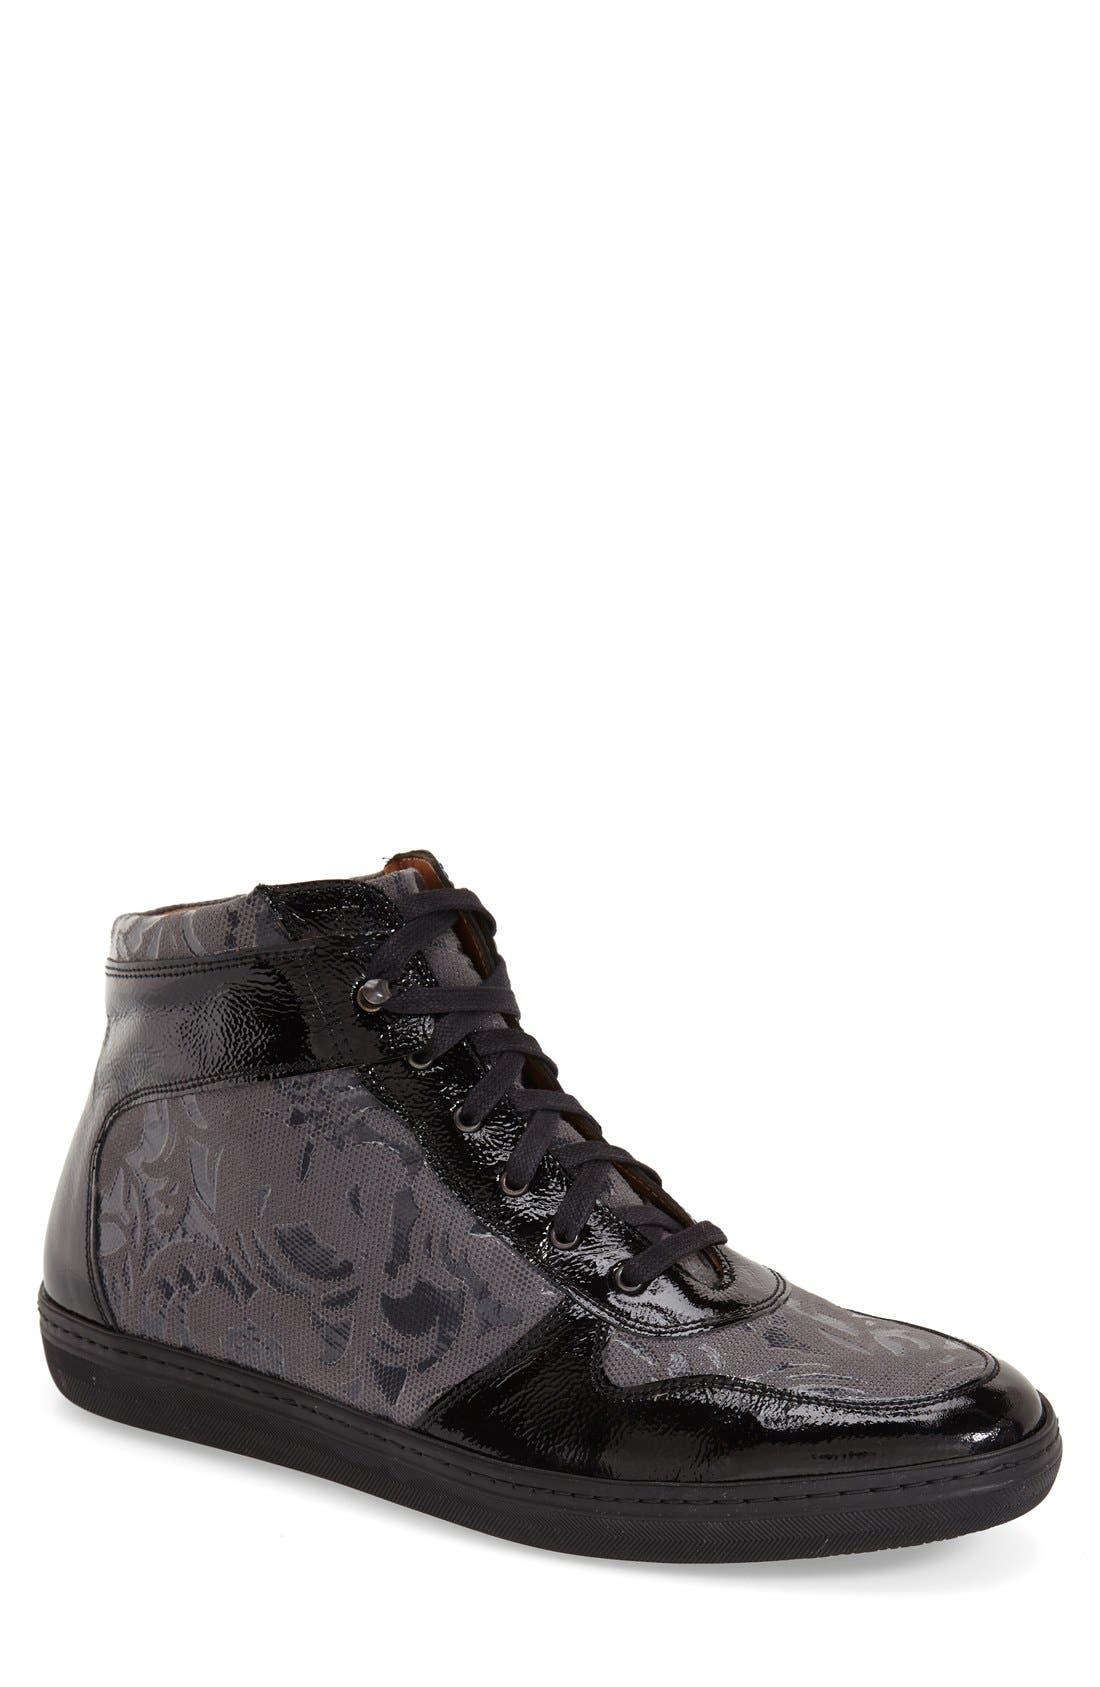 Mezlan 'Andorra' Sneaker Men fashion shoes clearance  hot sale online